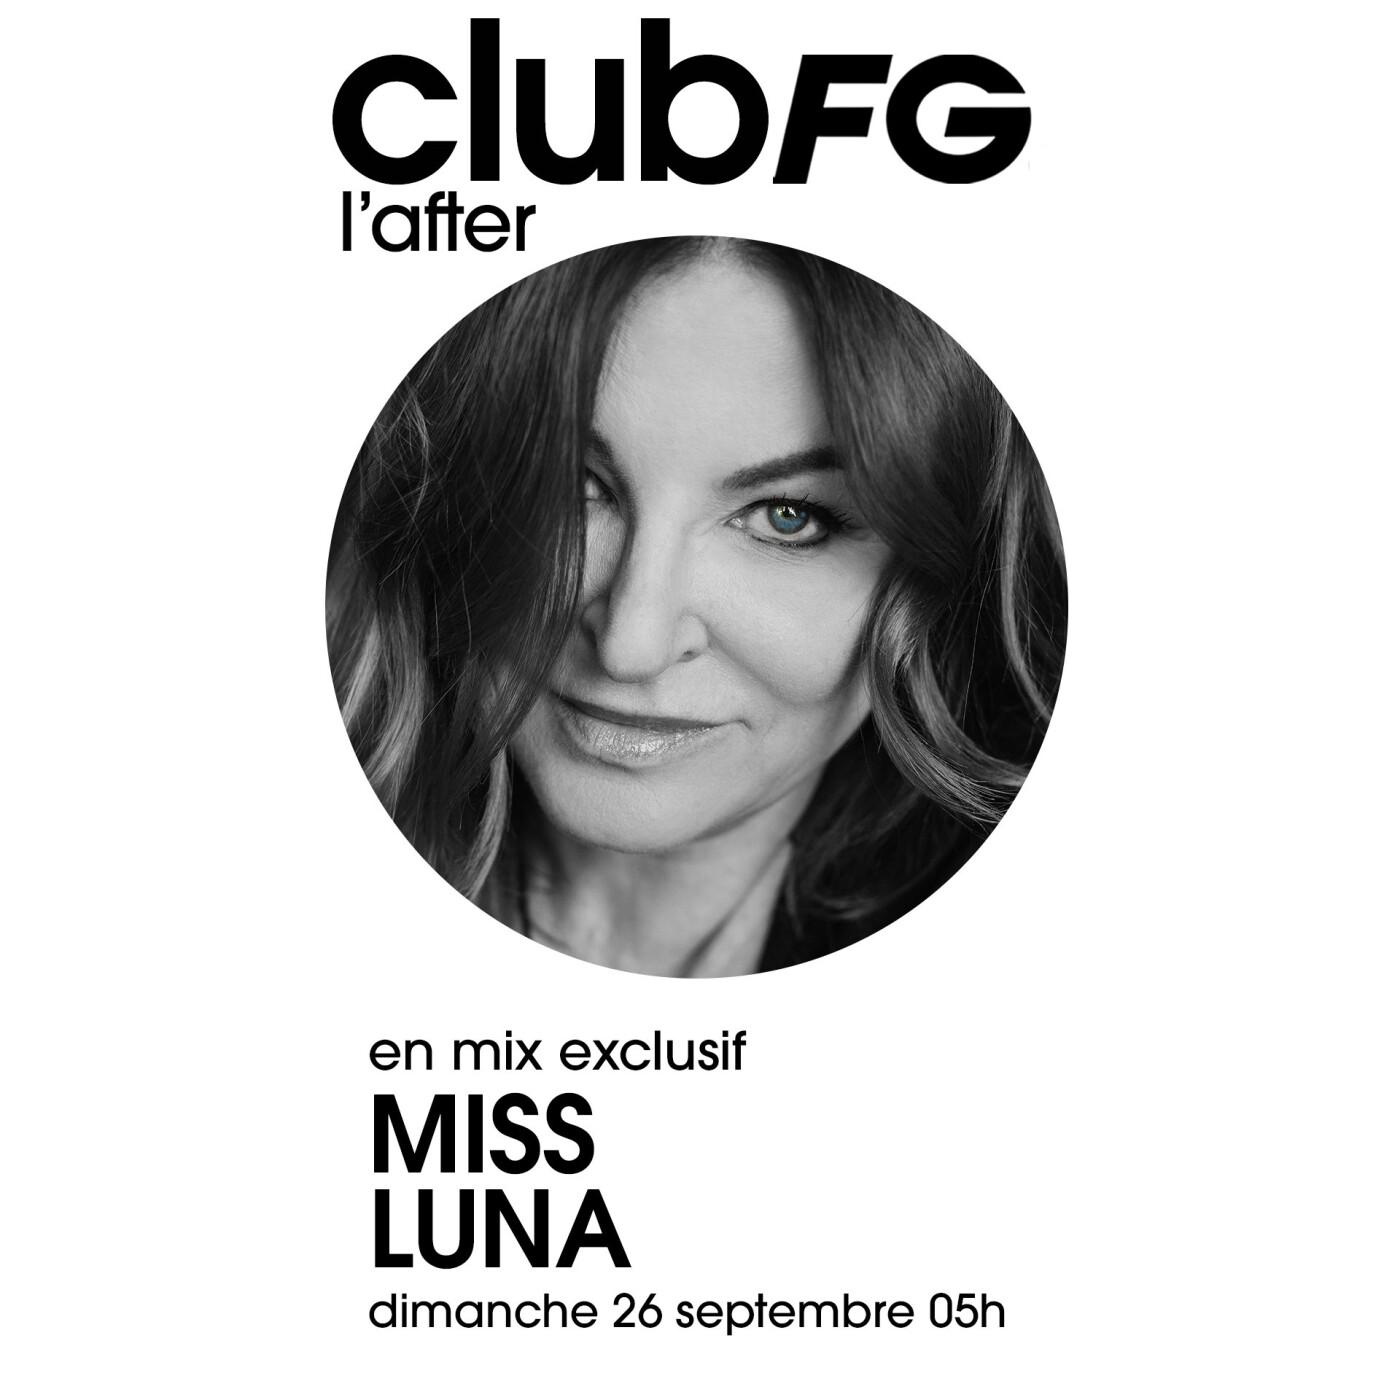 CLUB FG : MISS LUNA